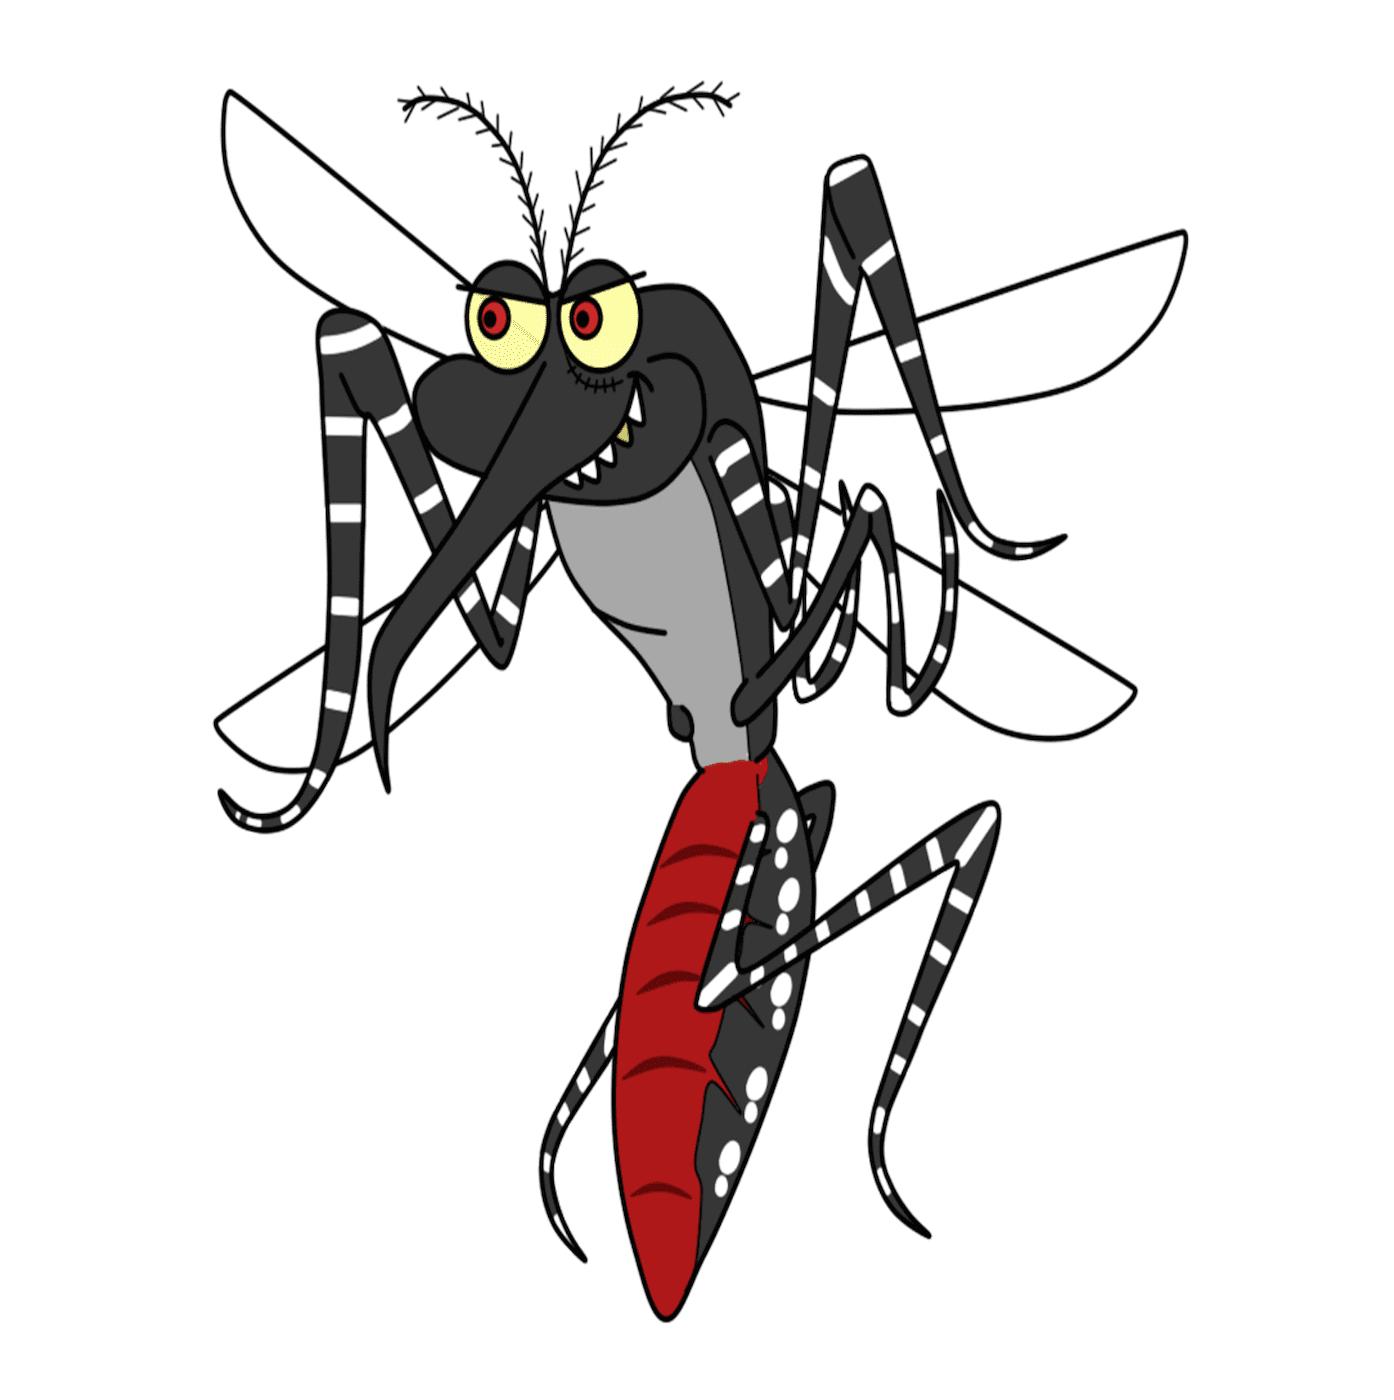 Image of mozzie. Mosquito Repellant.